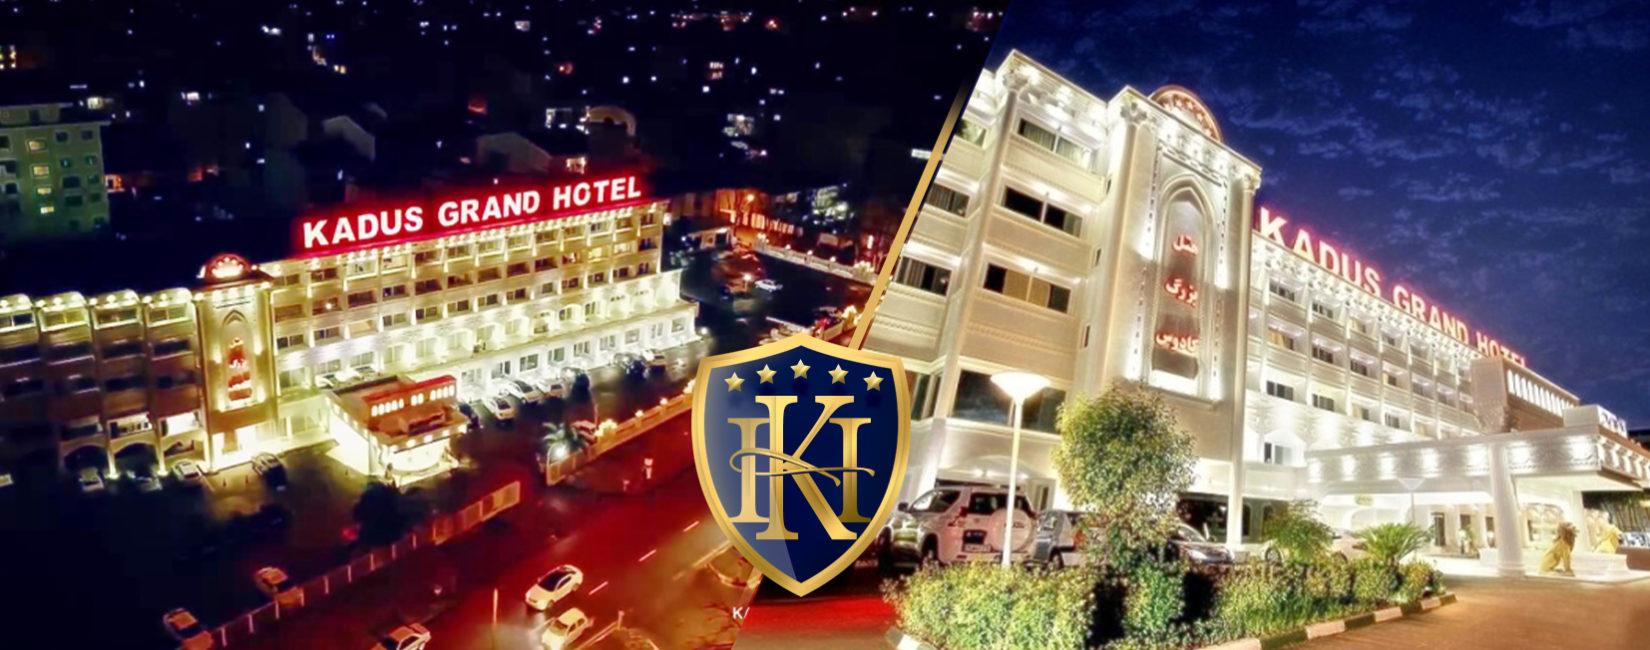 هتل پنج ستاره با موقعیت مکانی عالی